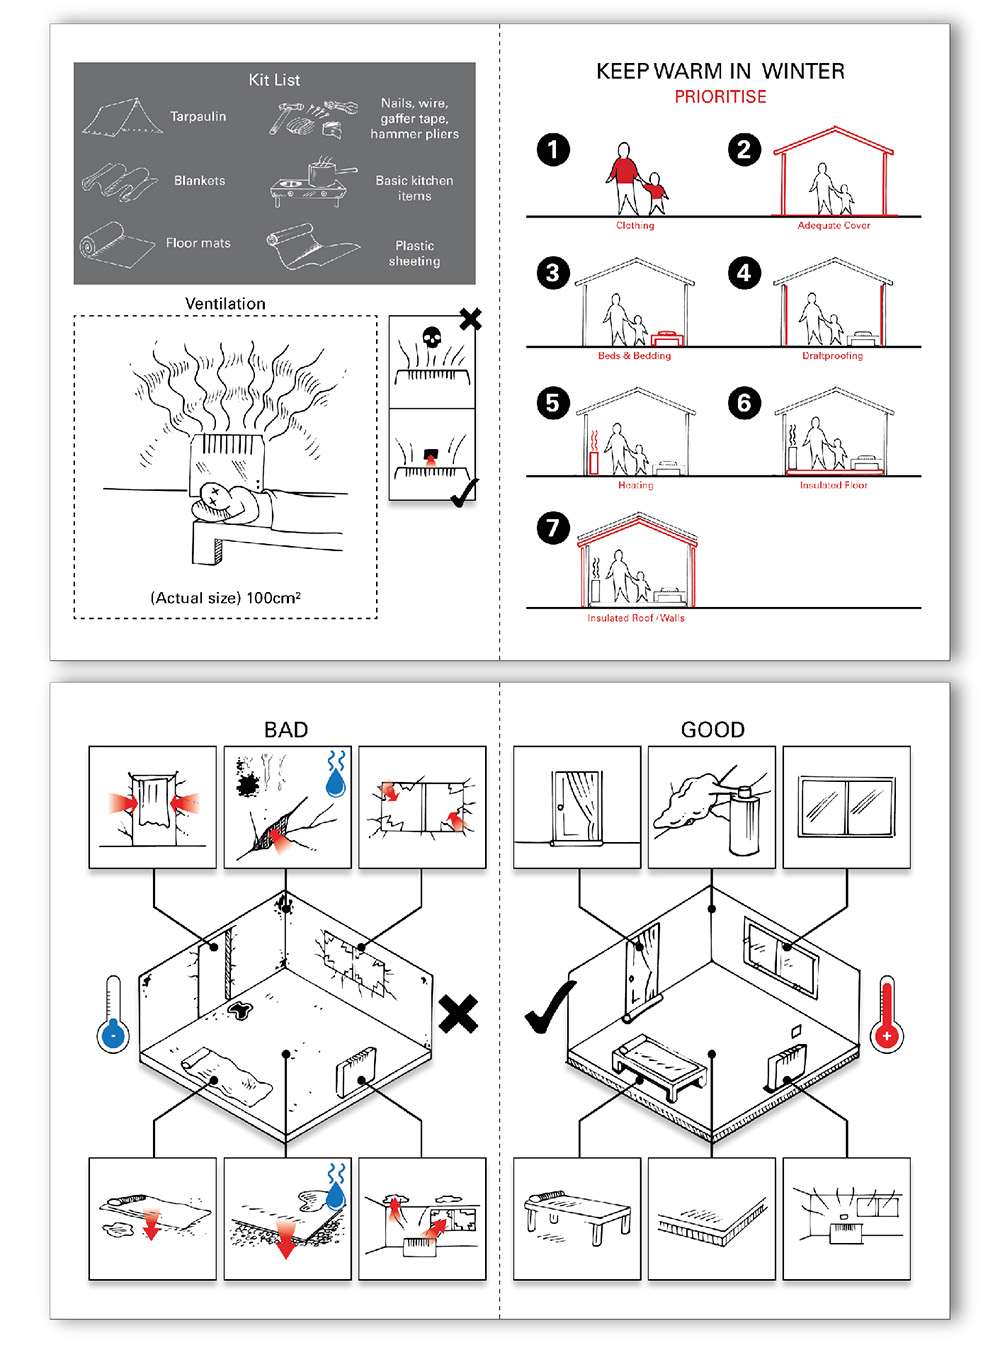 TDL instruction manual concepts